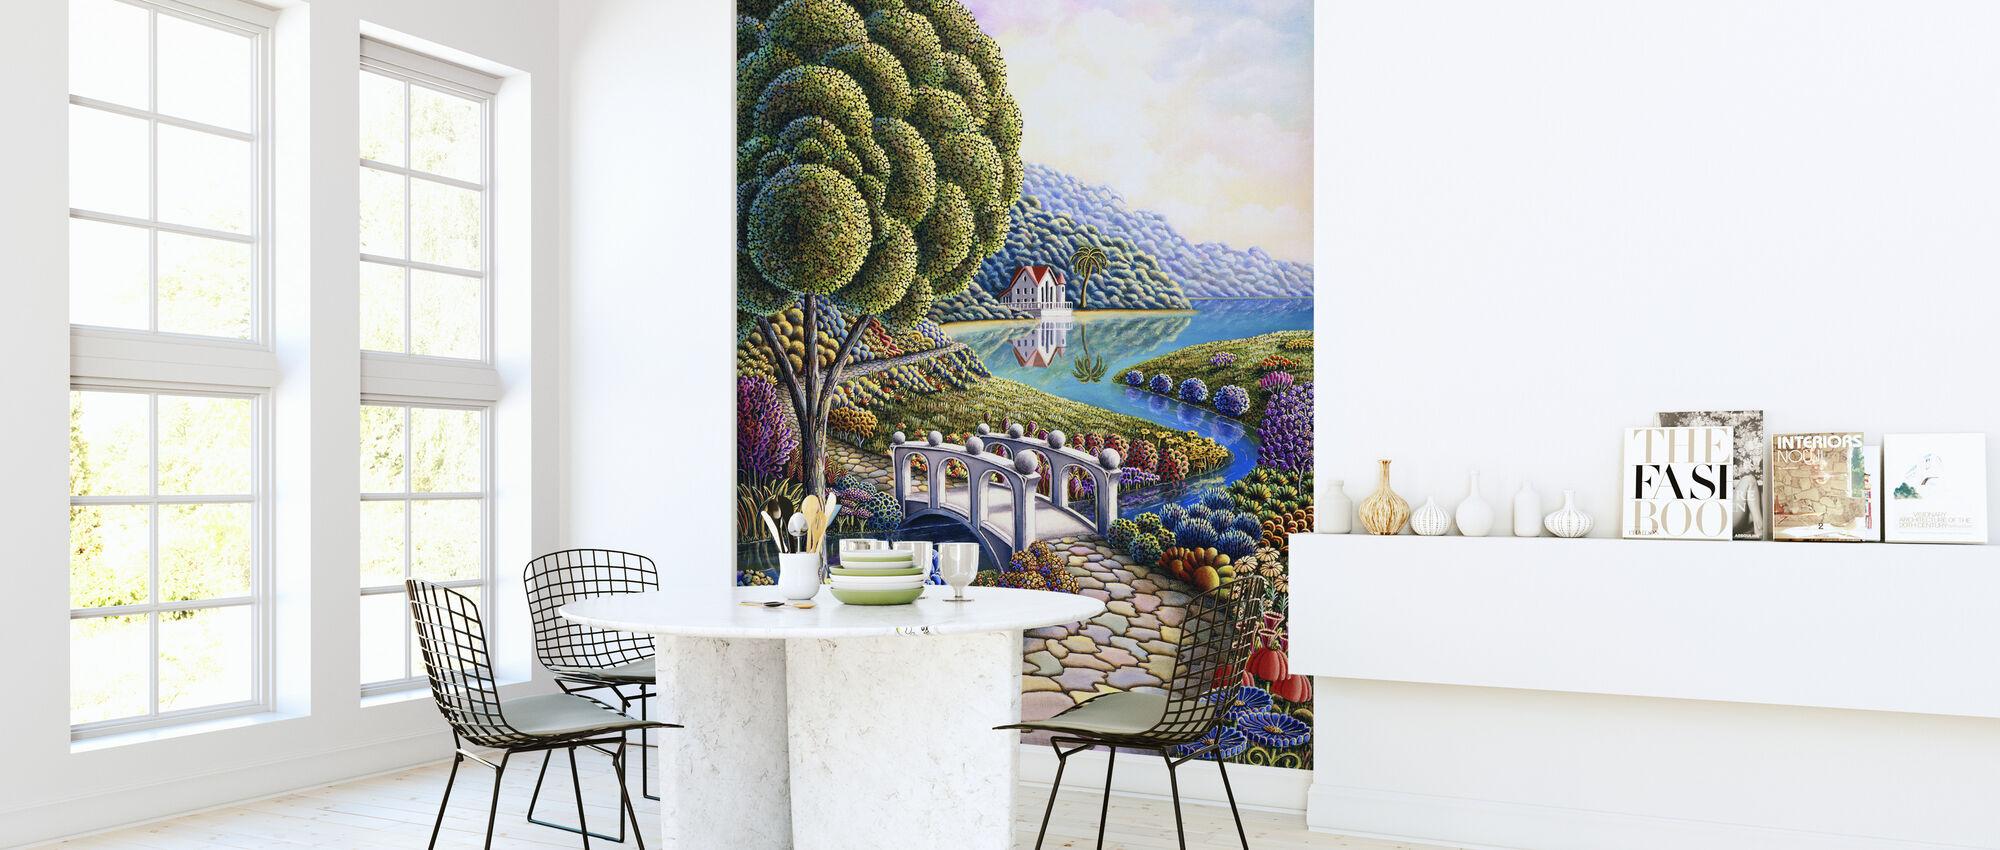 Daffodils - Wallpaper - Kitchen